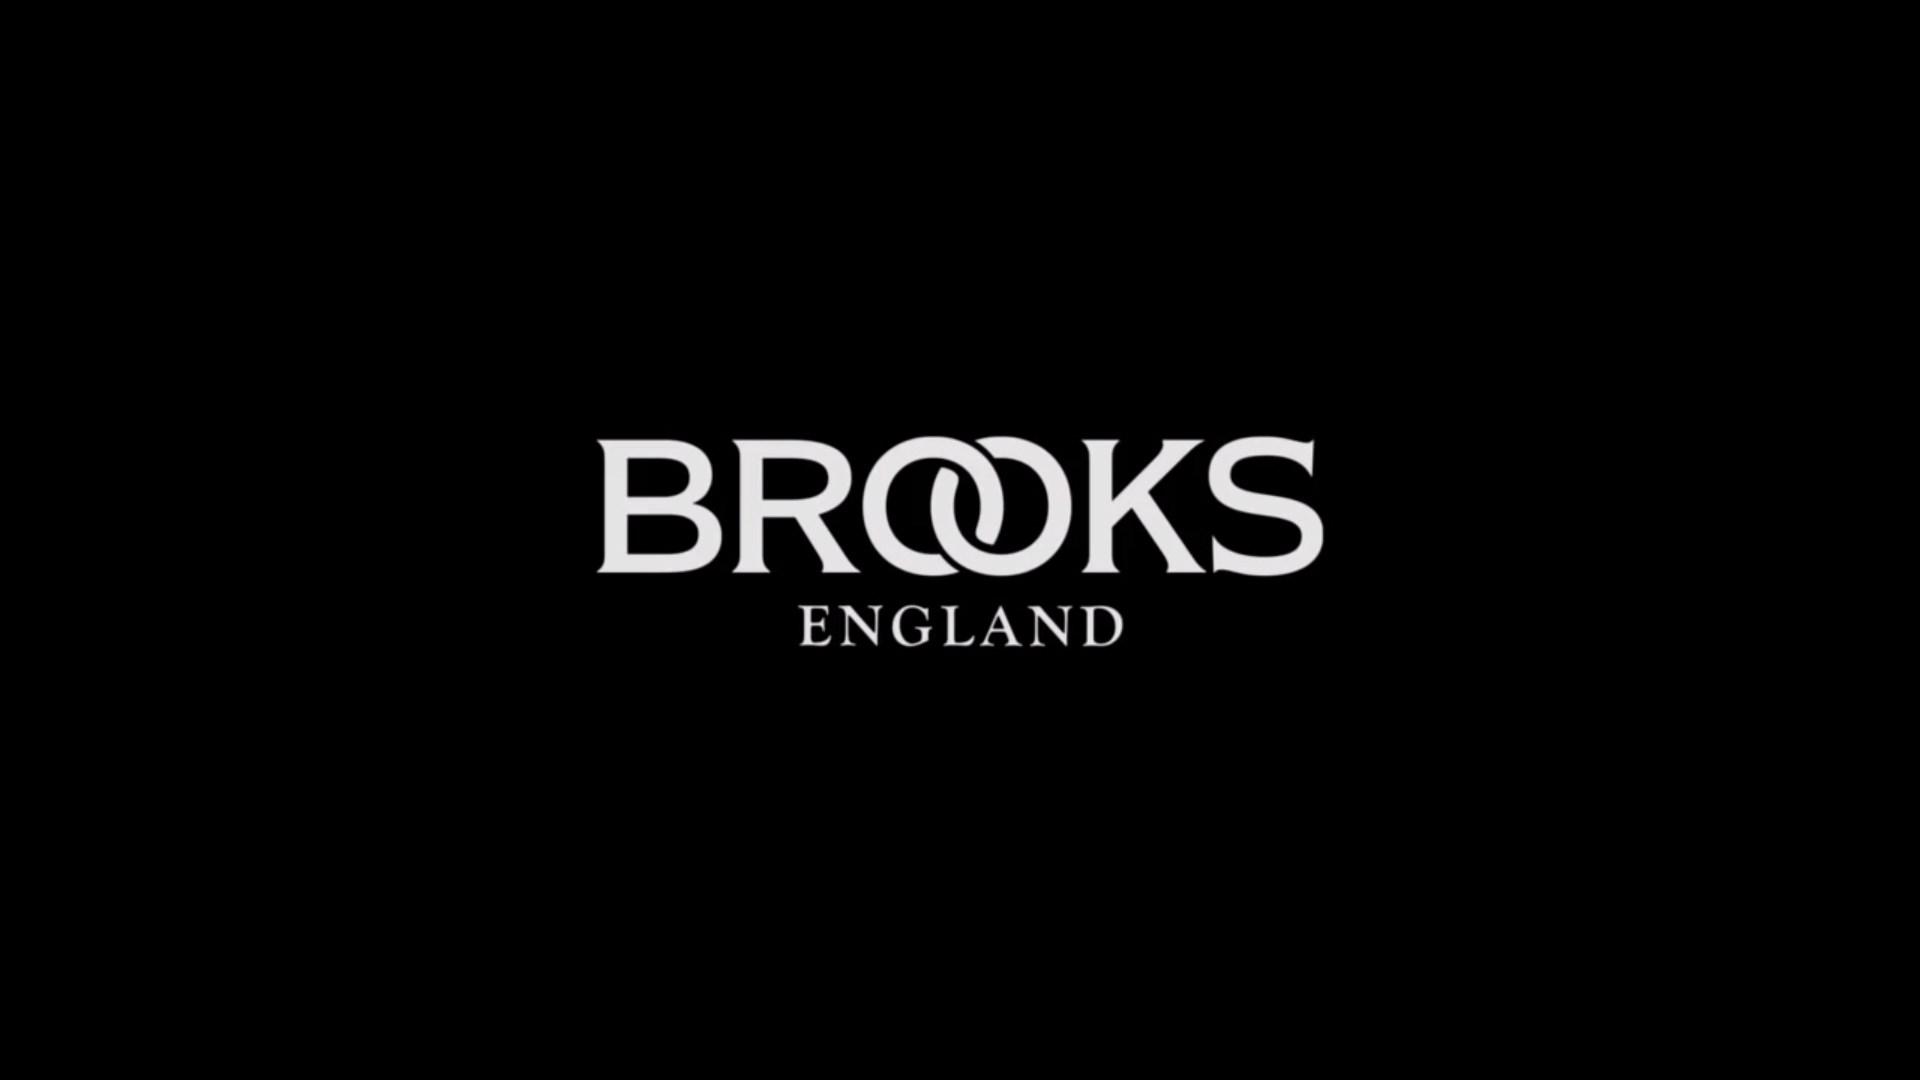 BROOKS ENGLAND - Leather Saddle Lines